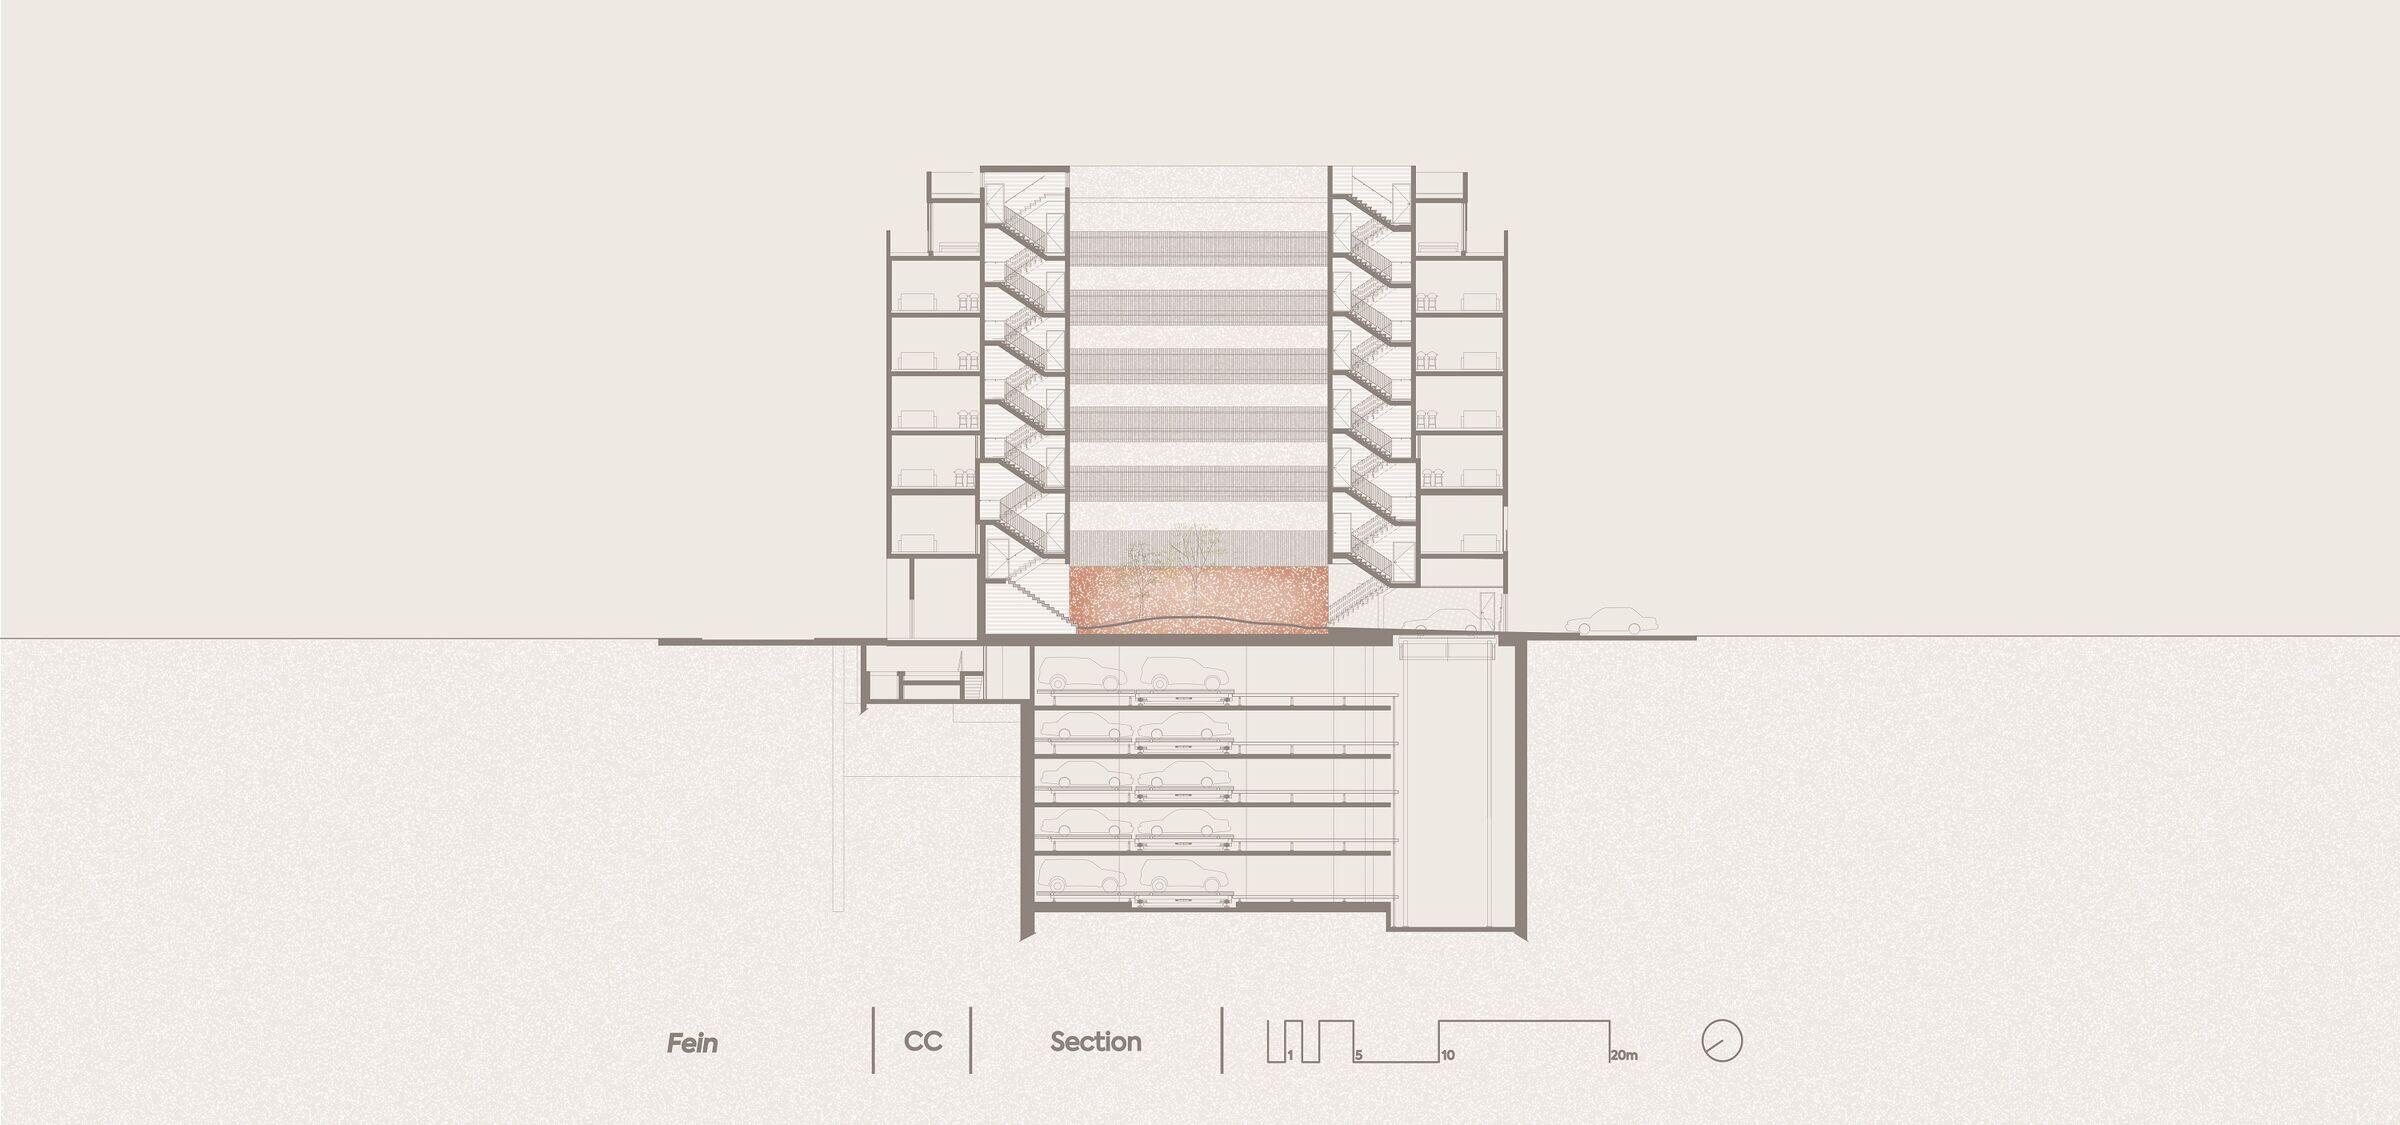 photo_credit HQ Architects